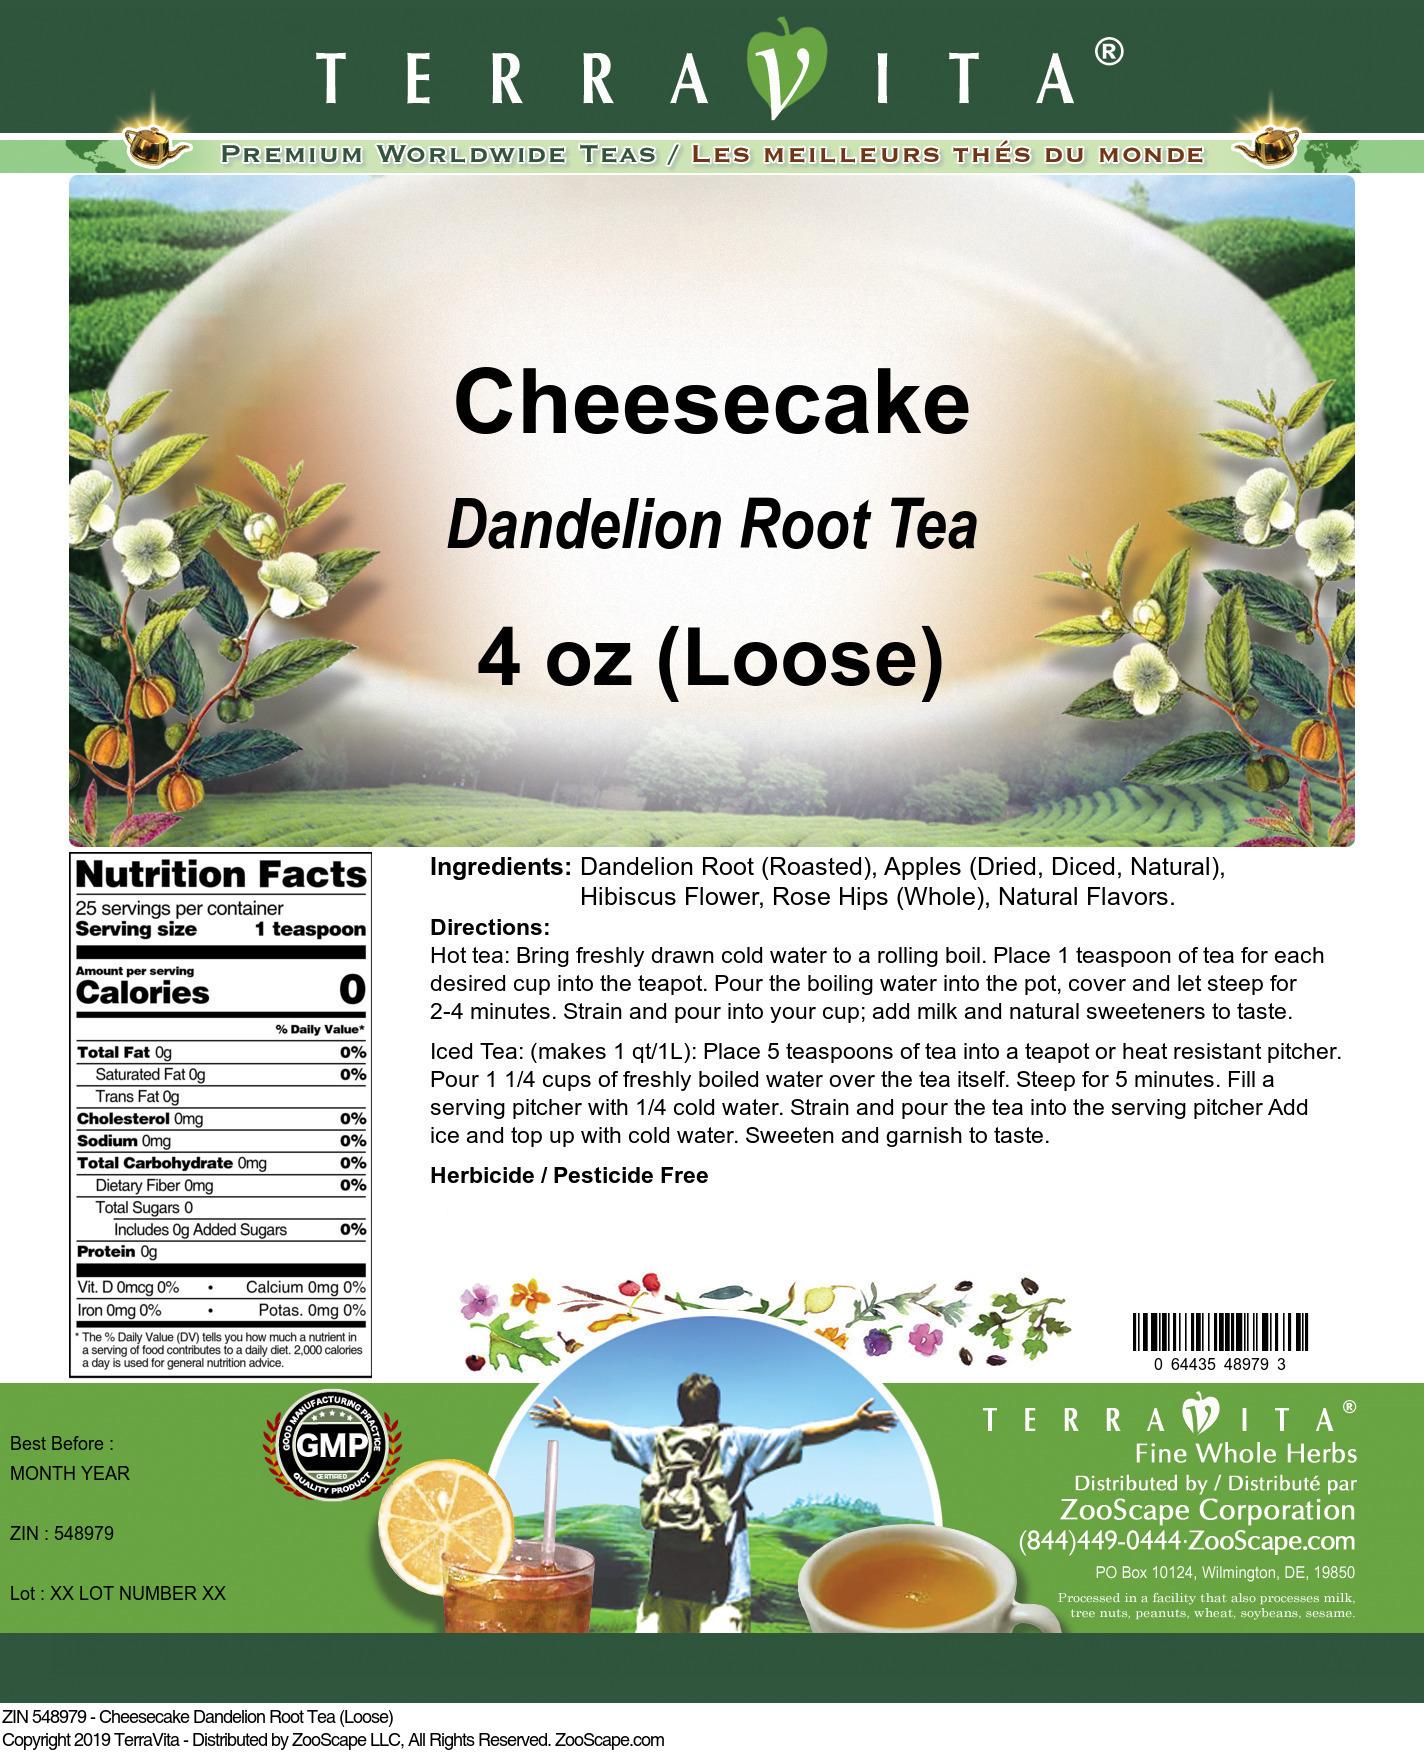 Cheesecake Dandelion Root